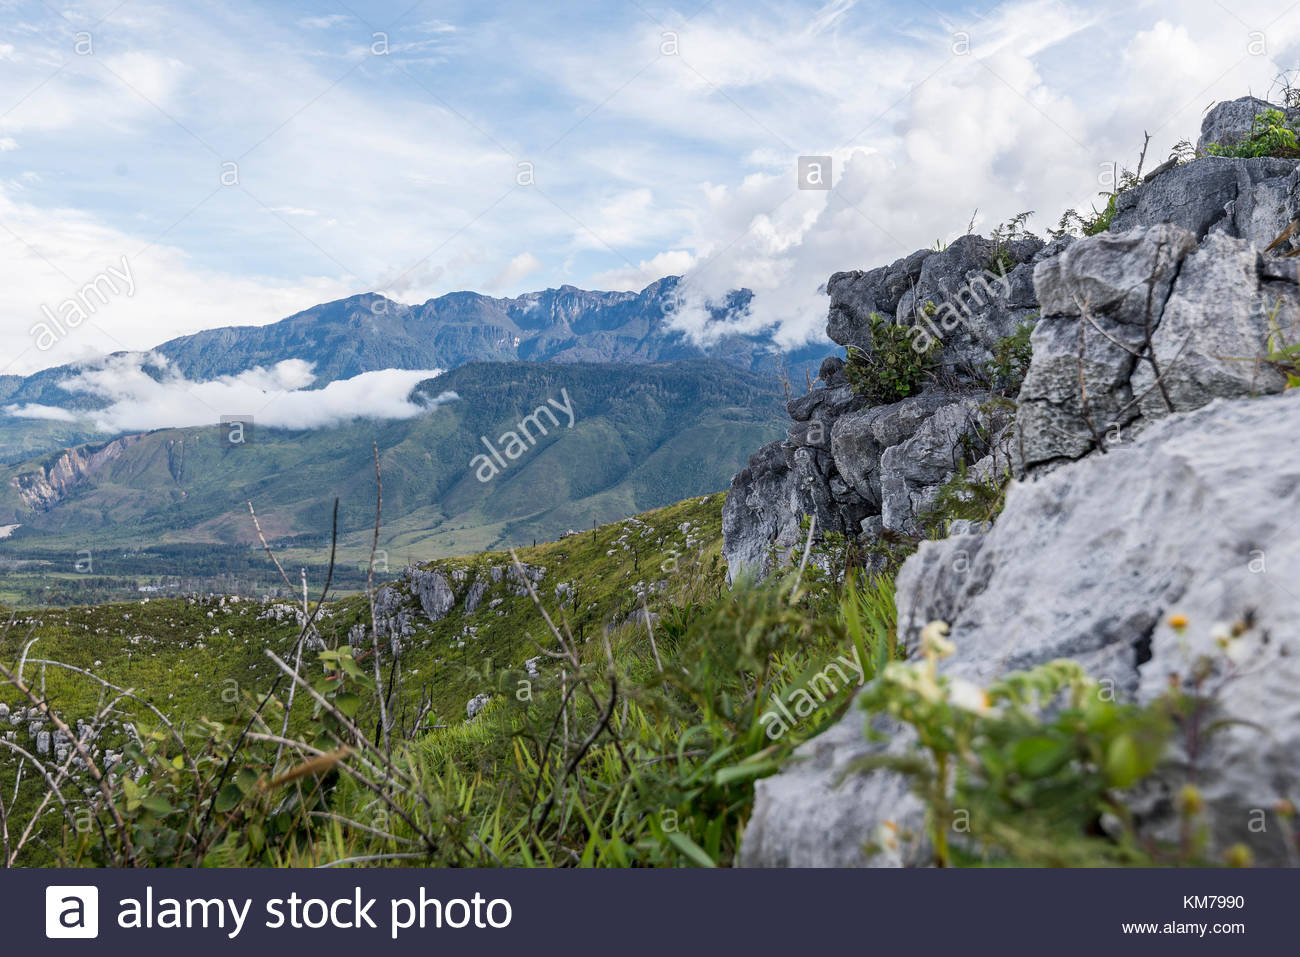 Hiking the hills around Wamena, Western Papua - Stock Image